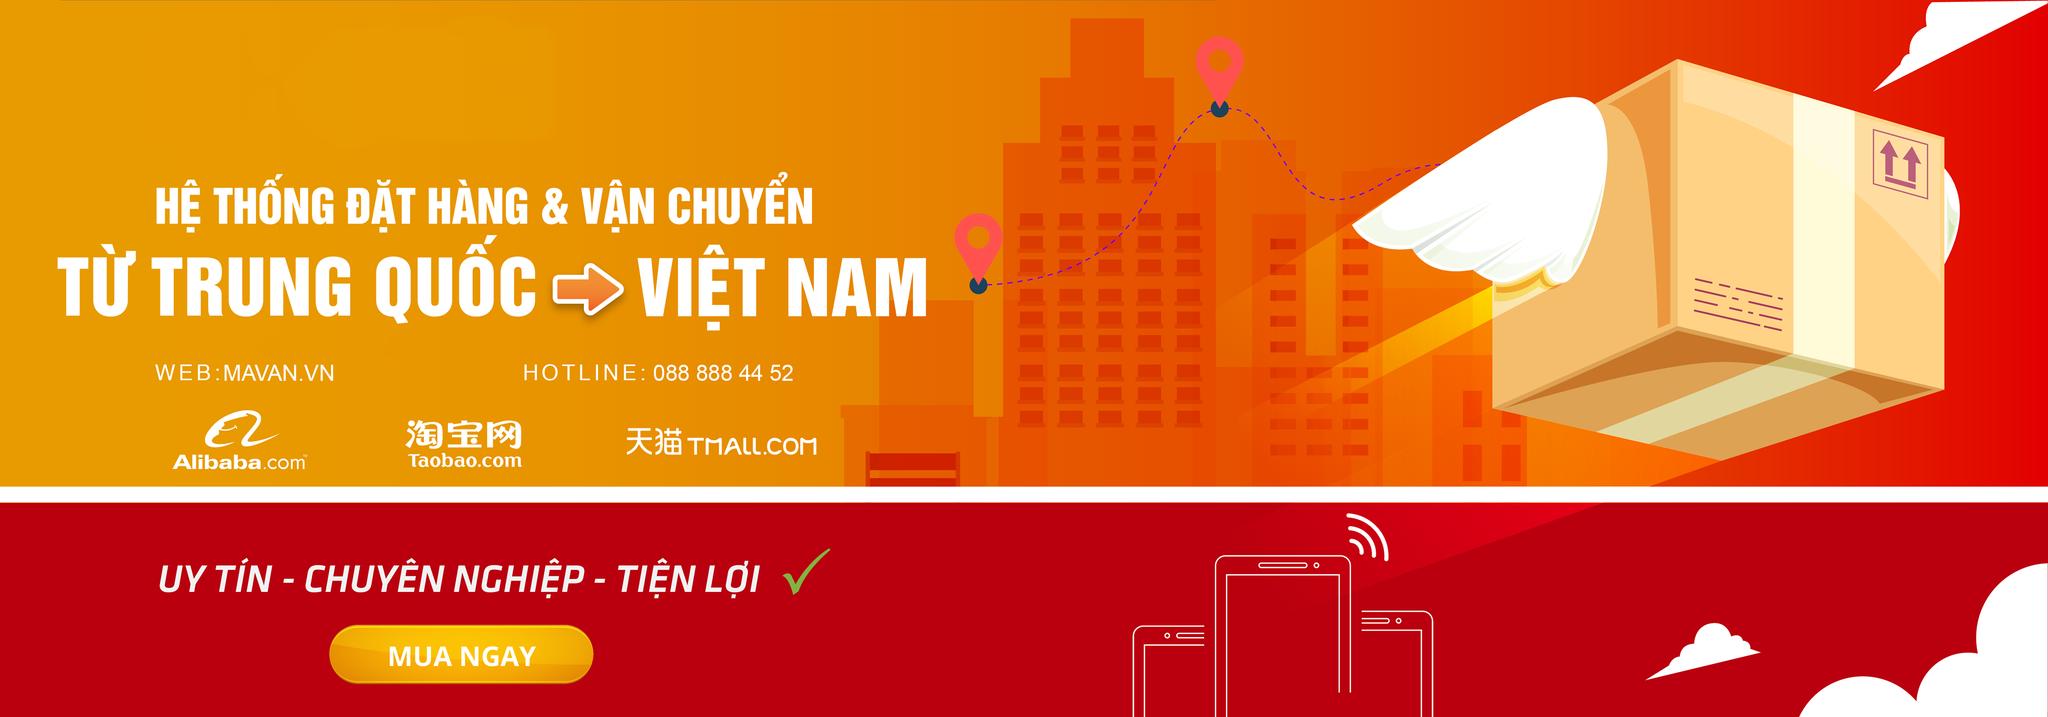 Đặt hàng taobao.com, tmall.com, 1688.com